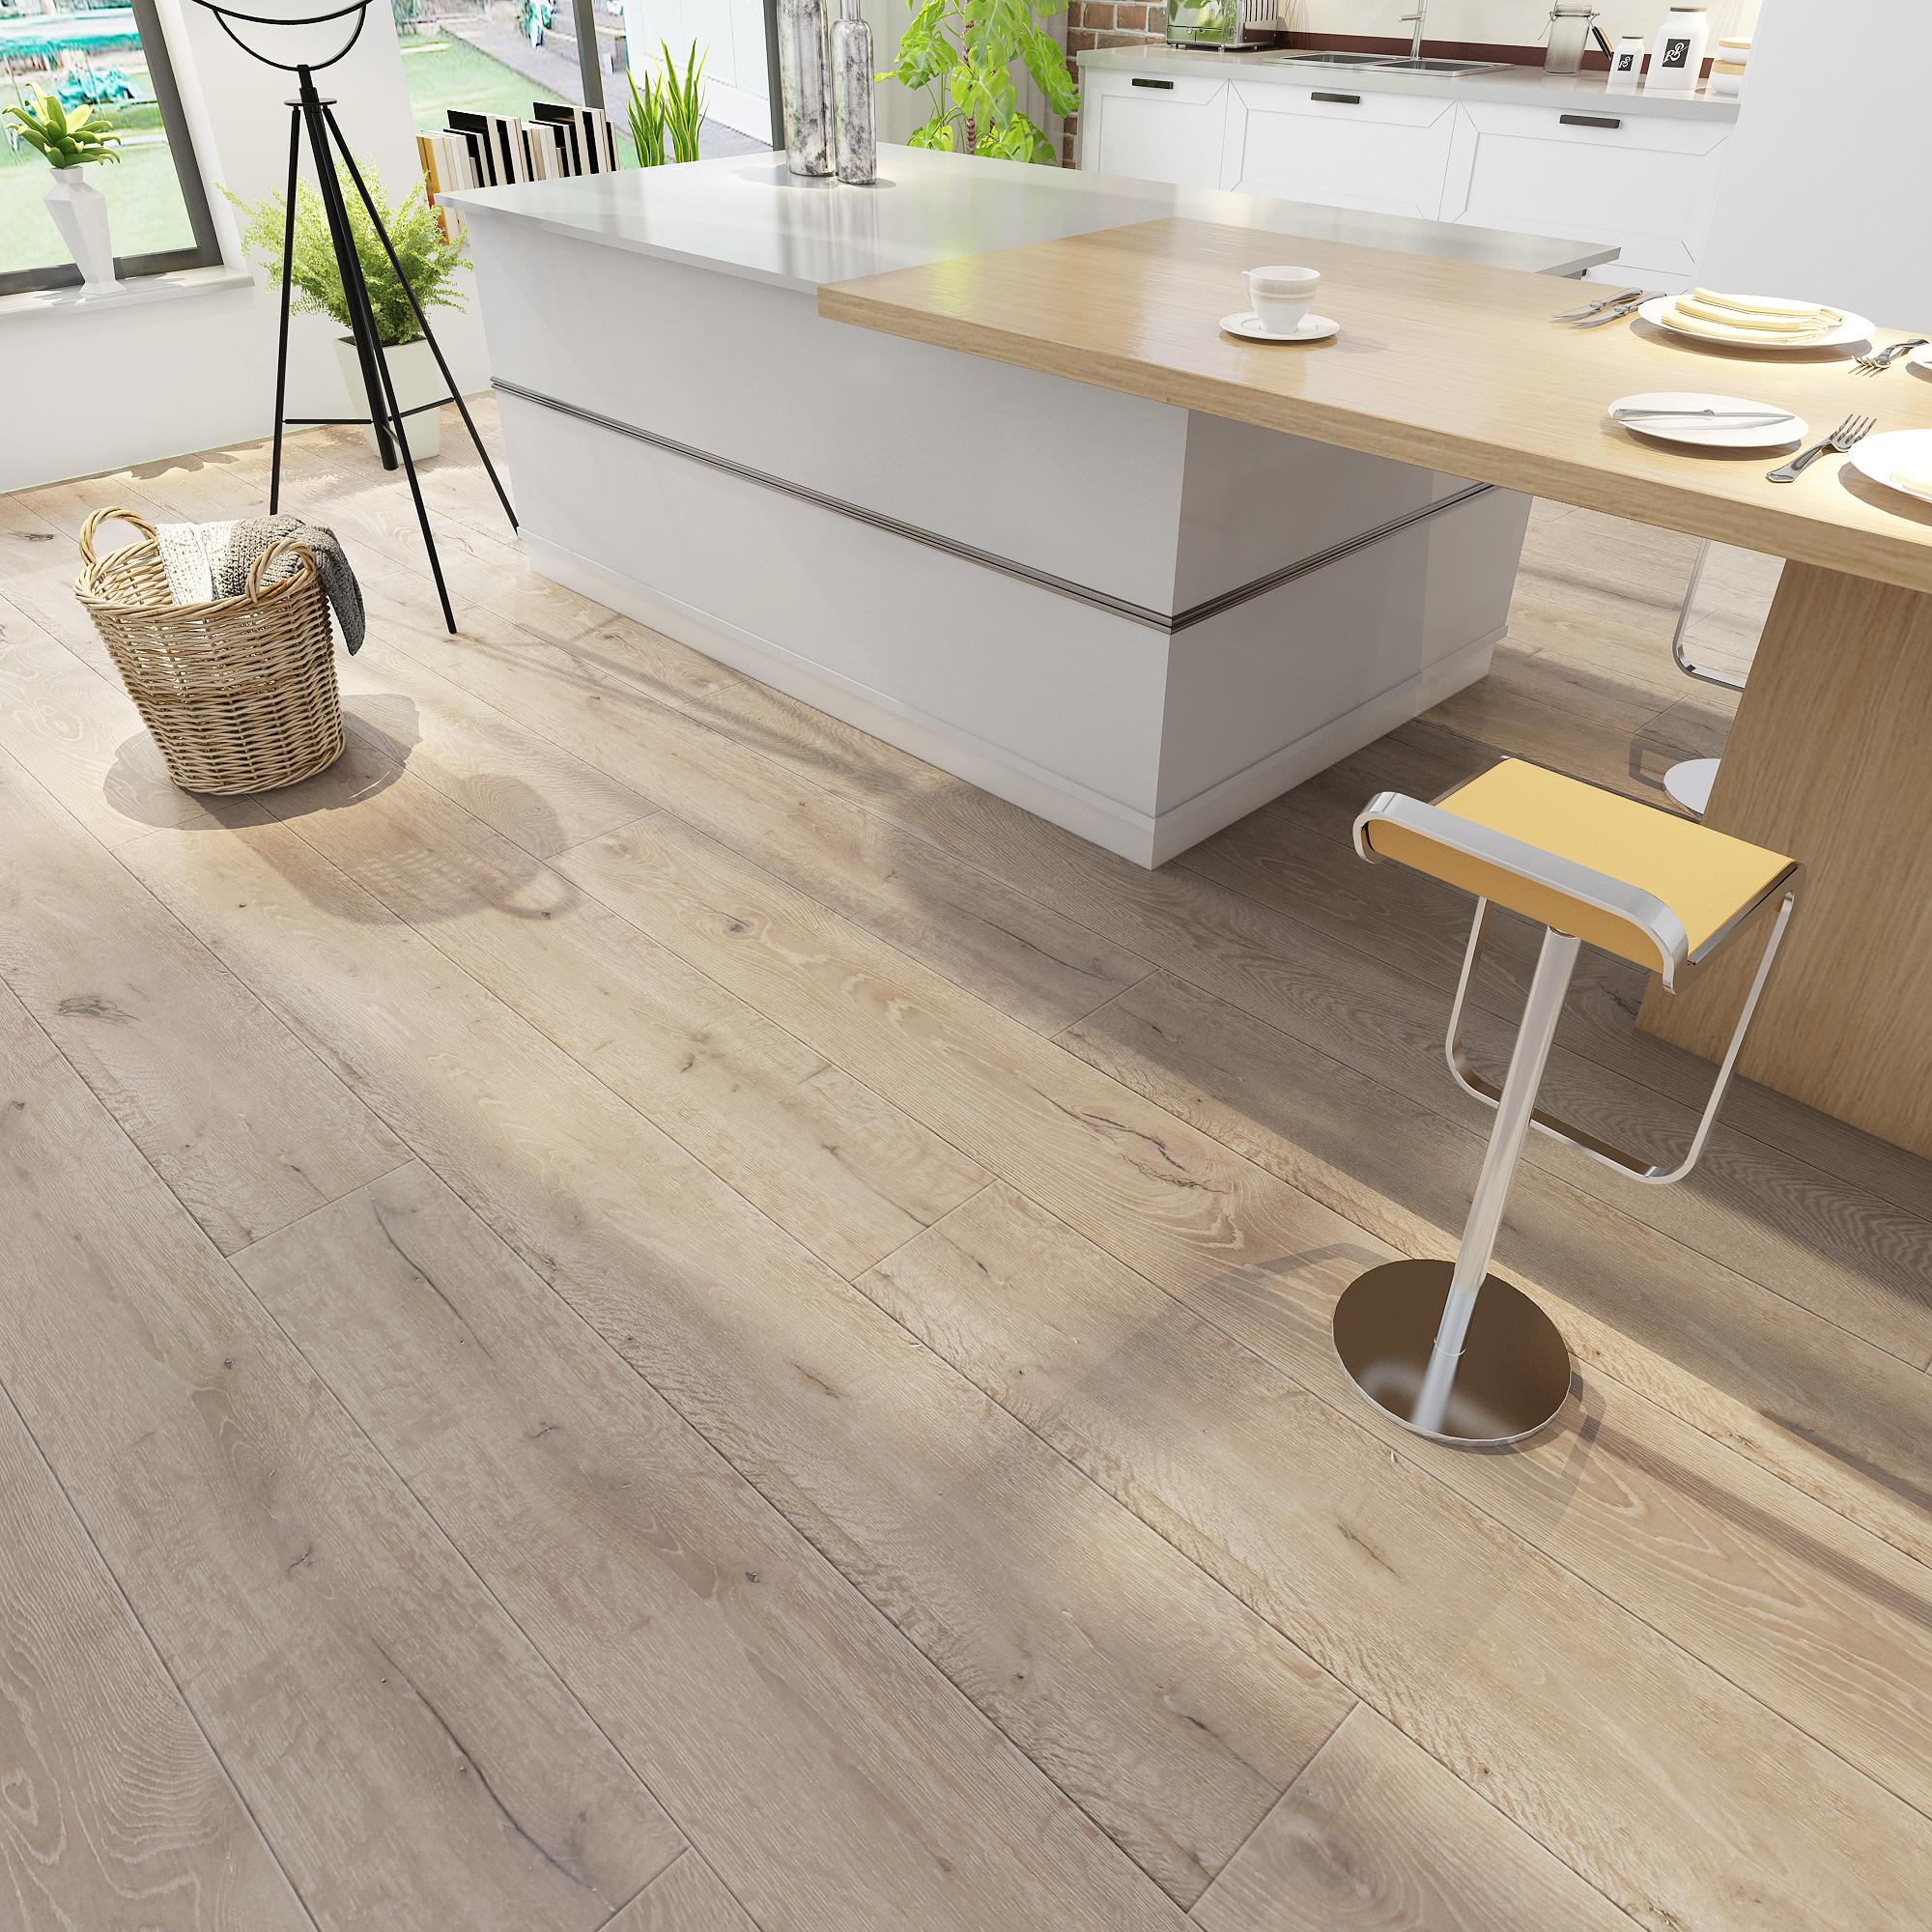 Lombardy_Kitchen 3.jpg